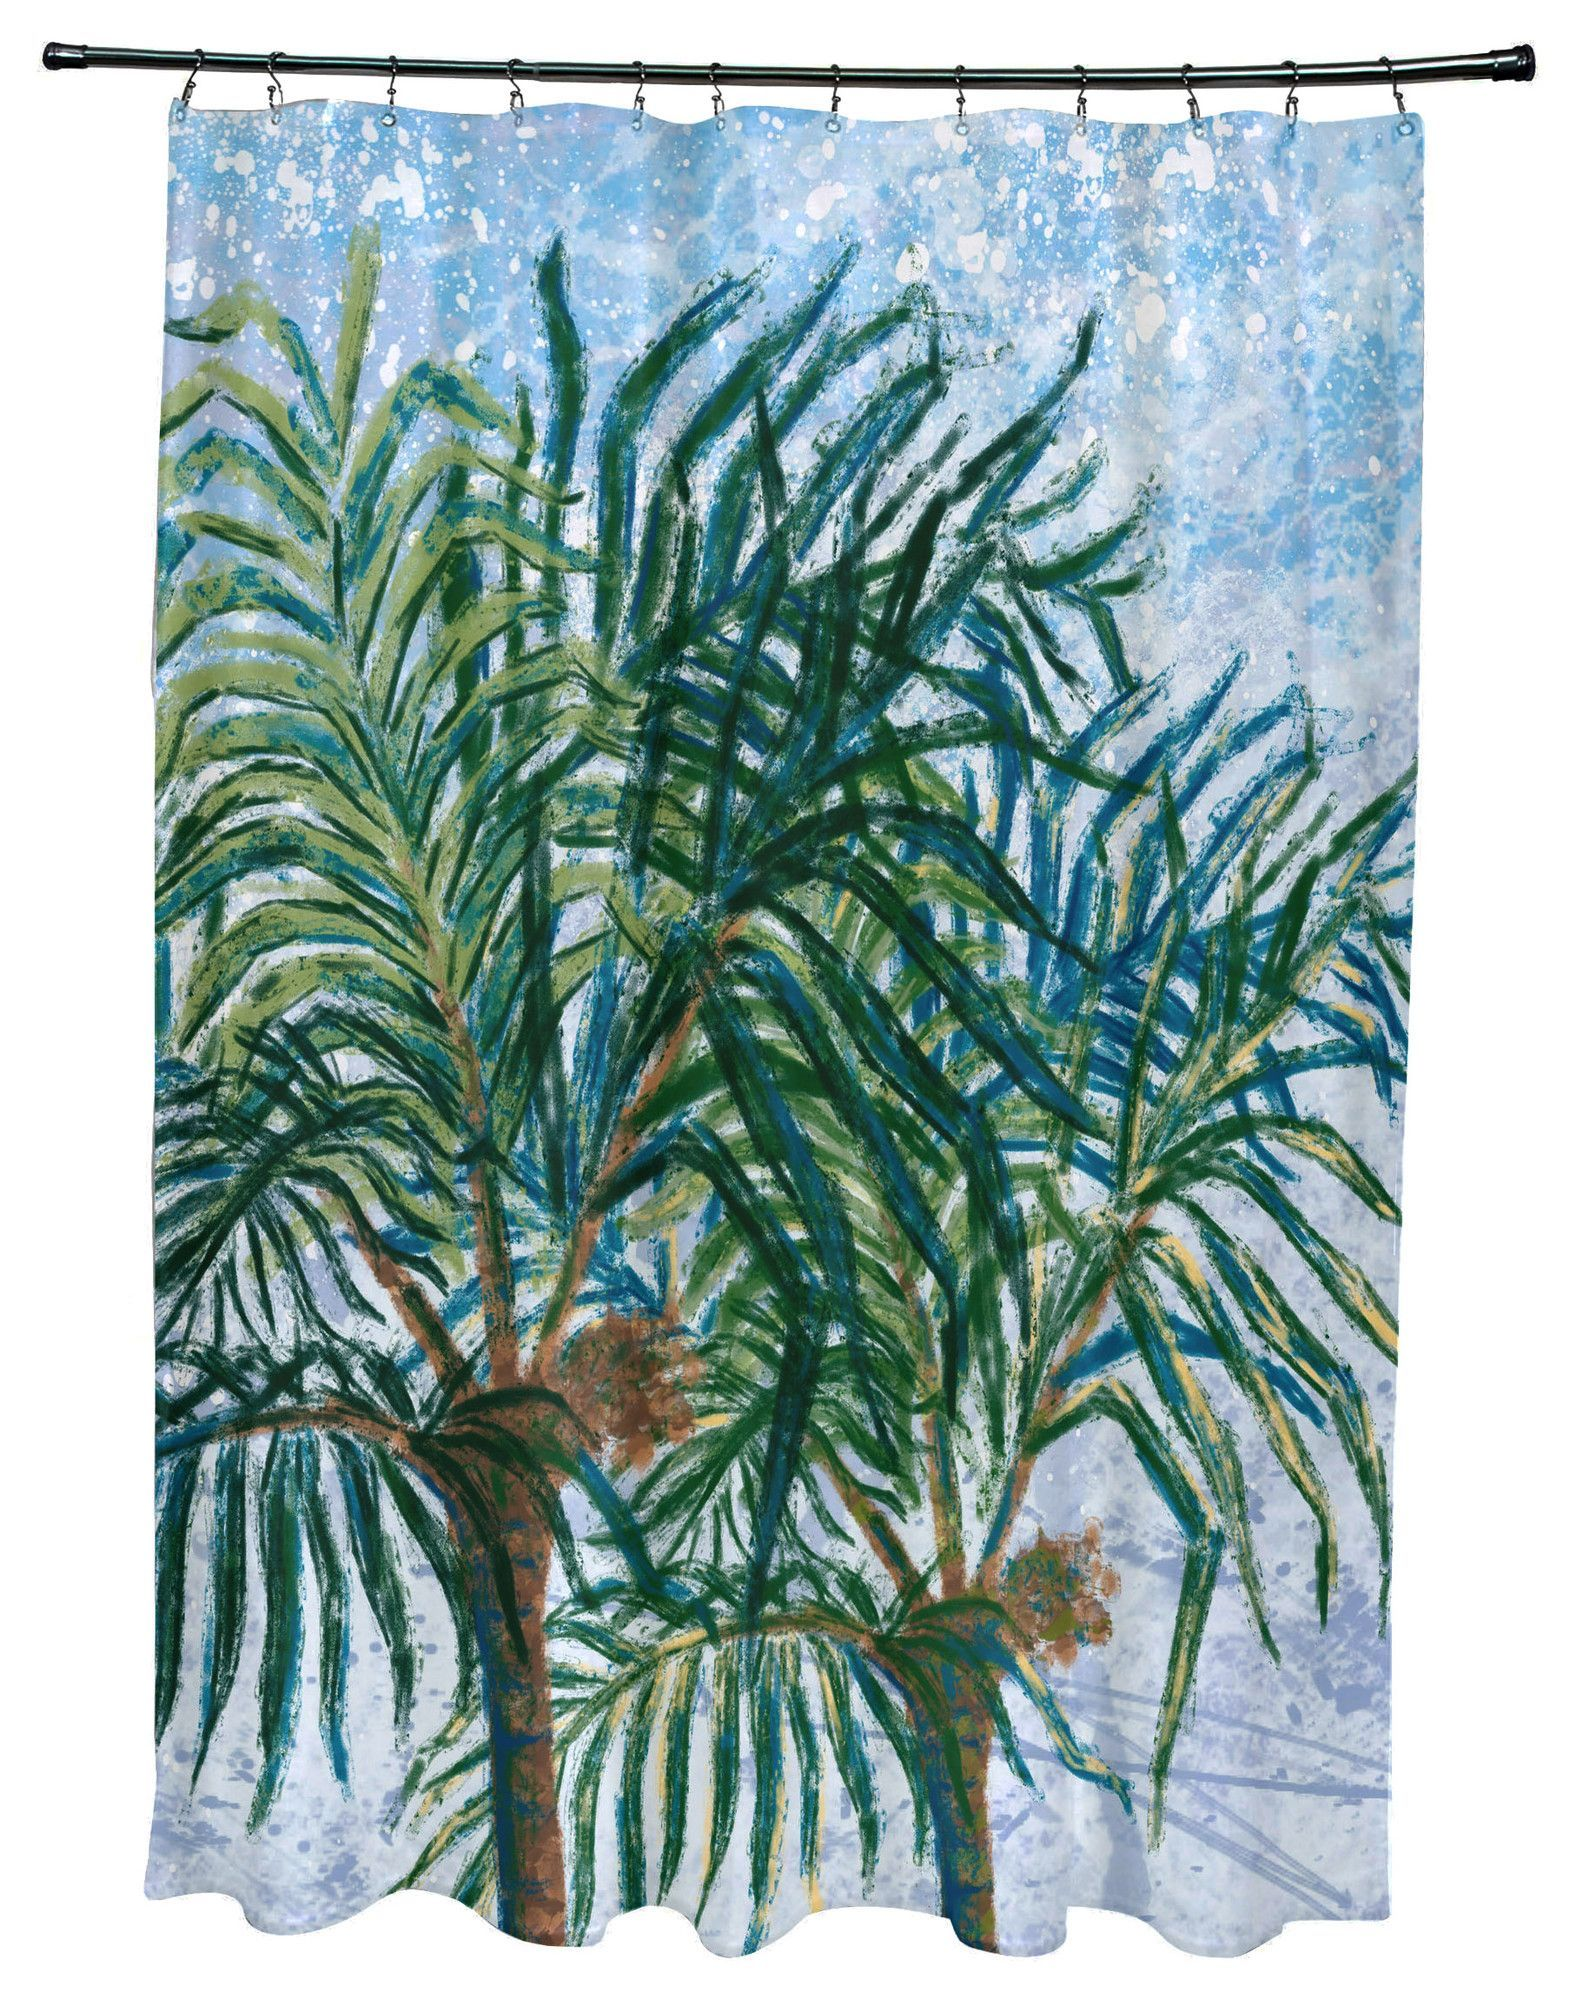 Kingbird Palms Floral Print Shower Curtain